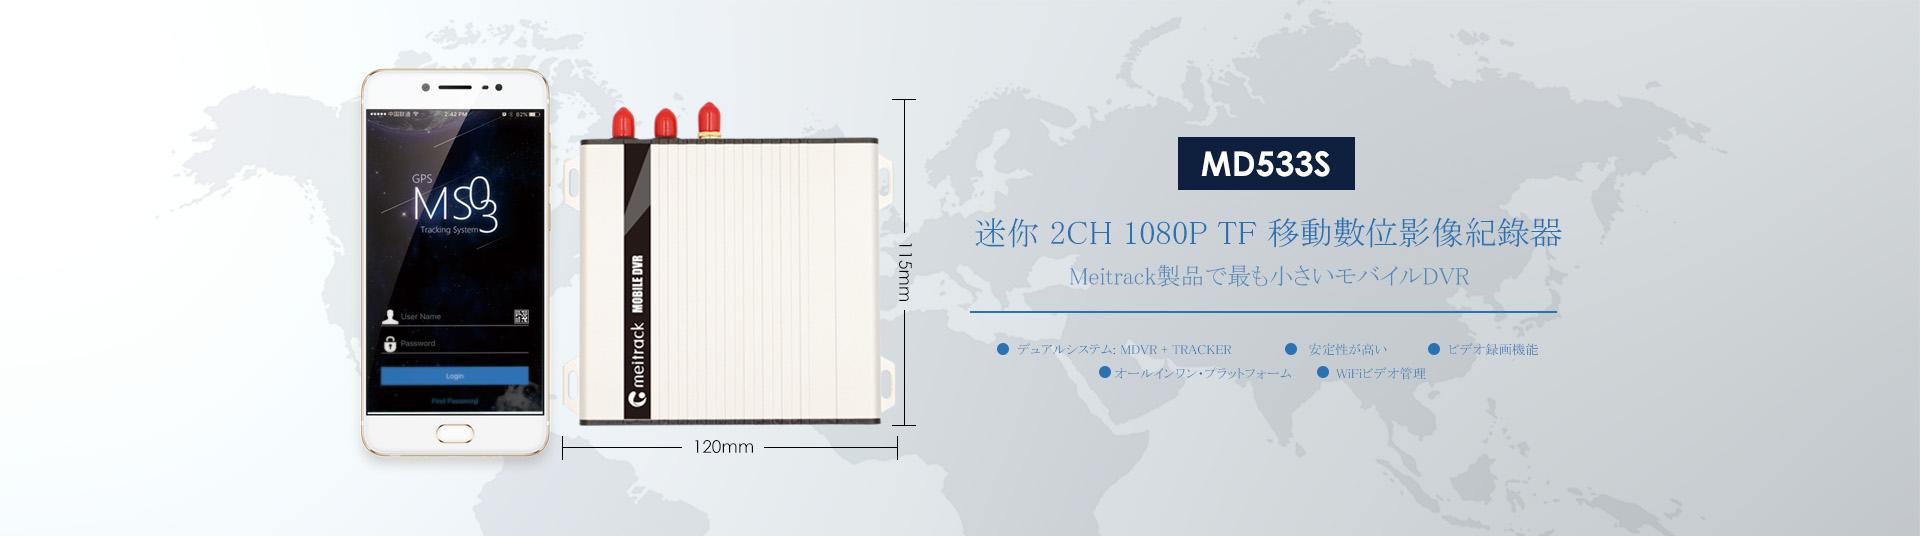 MD533S-banner_JP